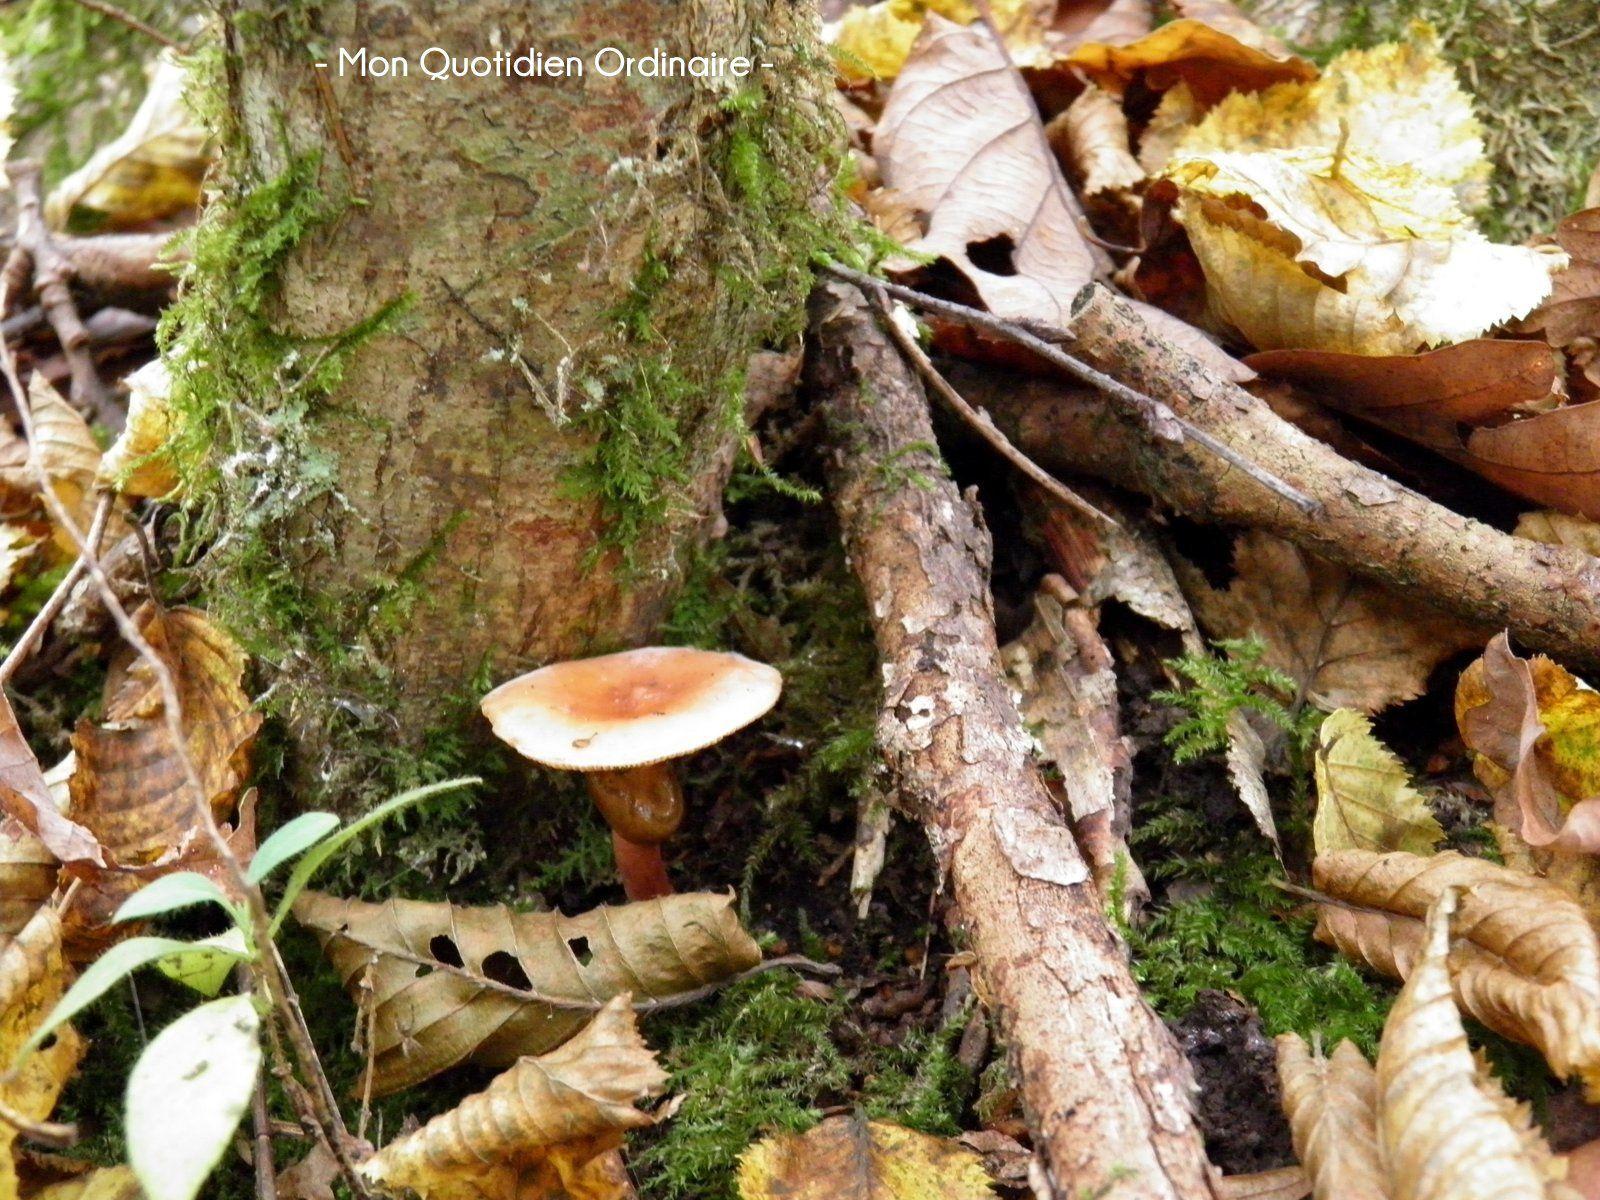 Les bruits de la forêt